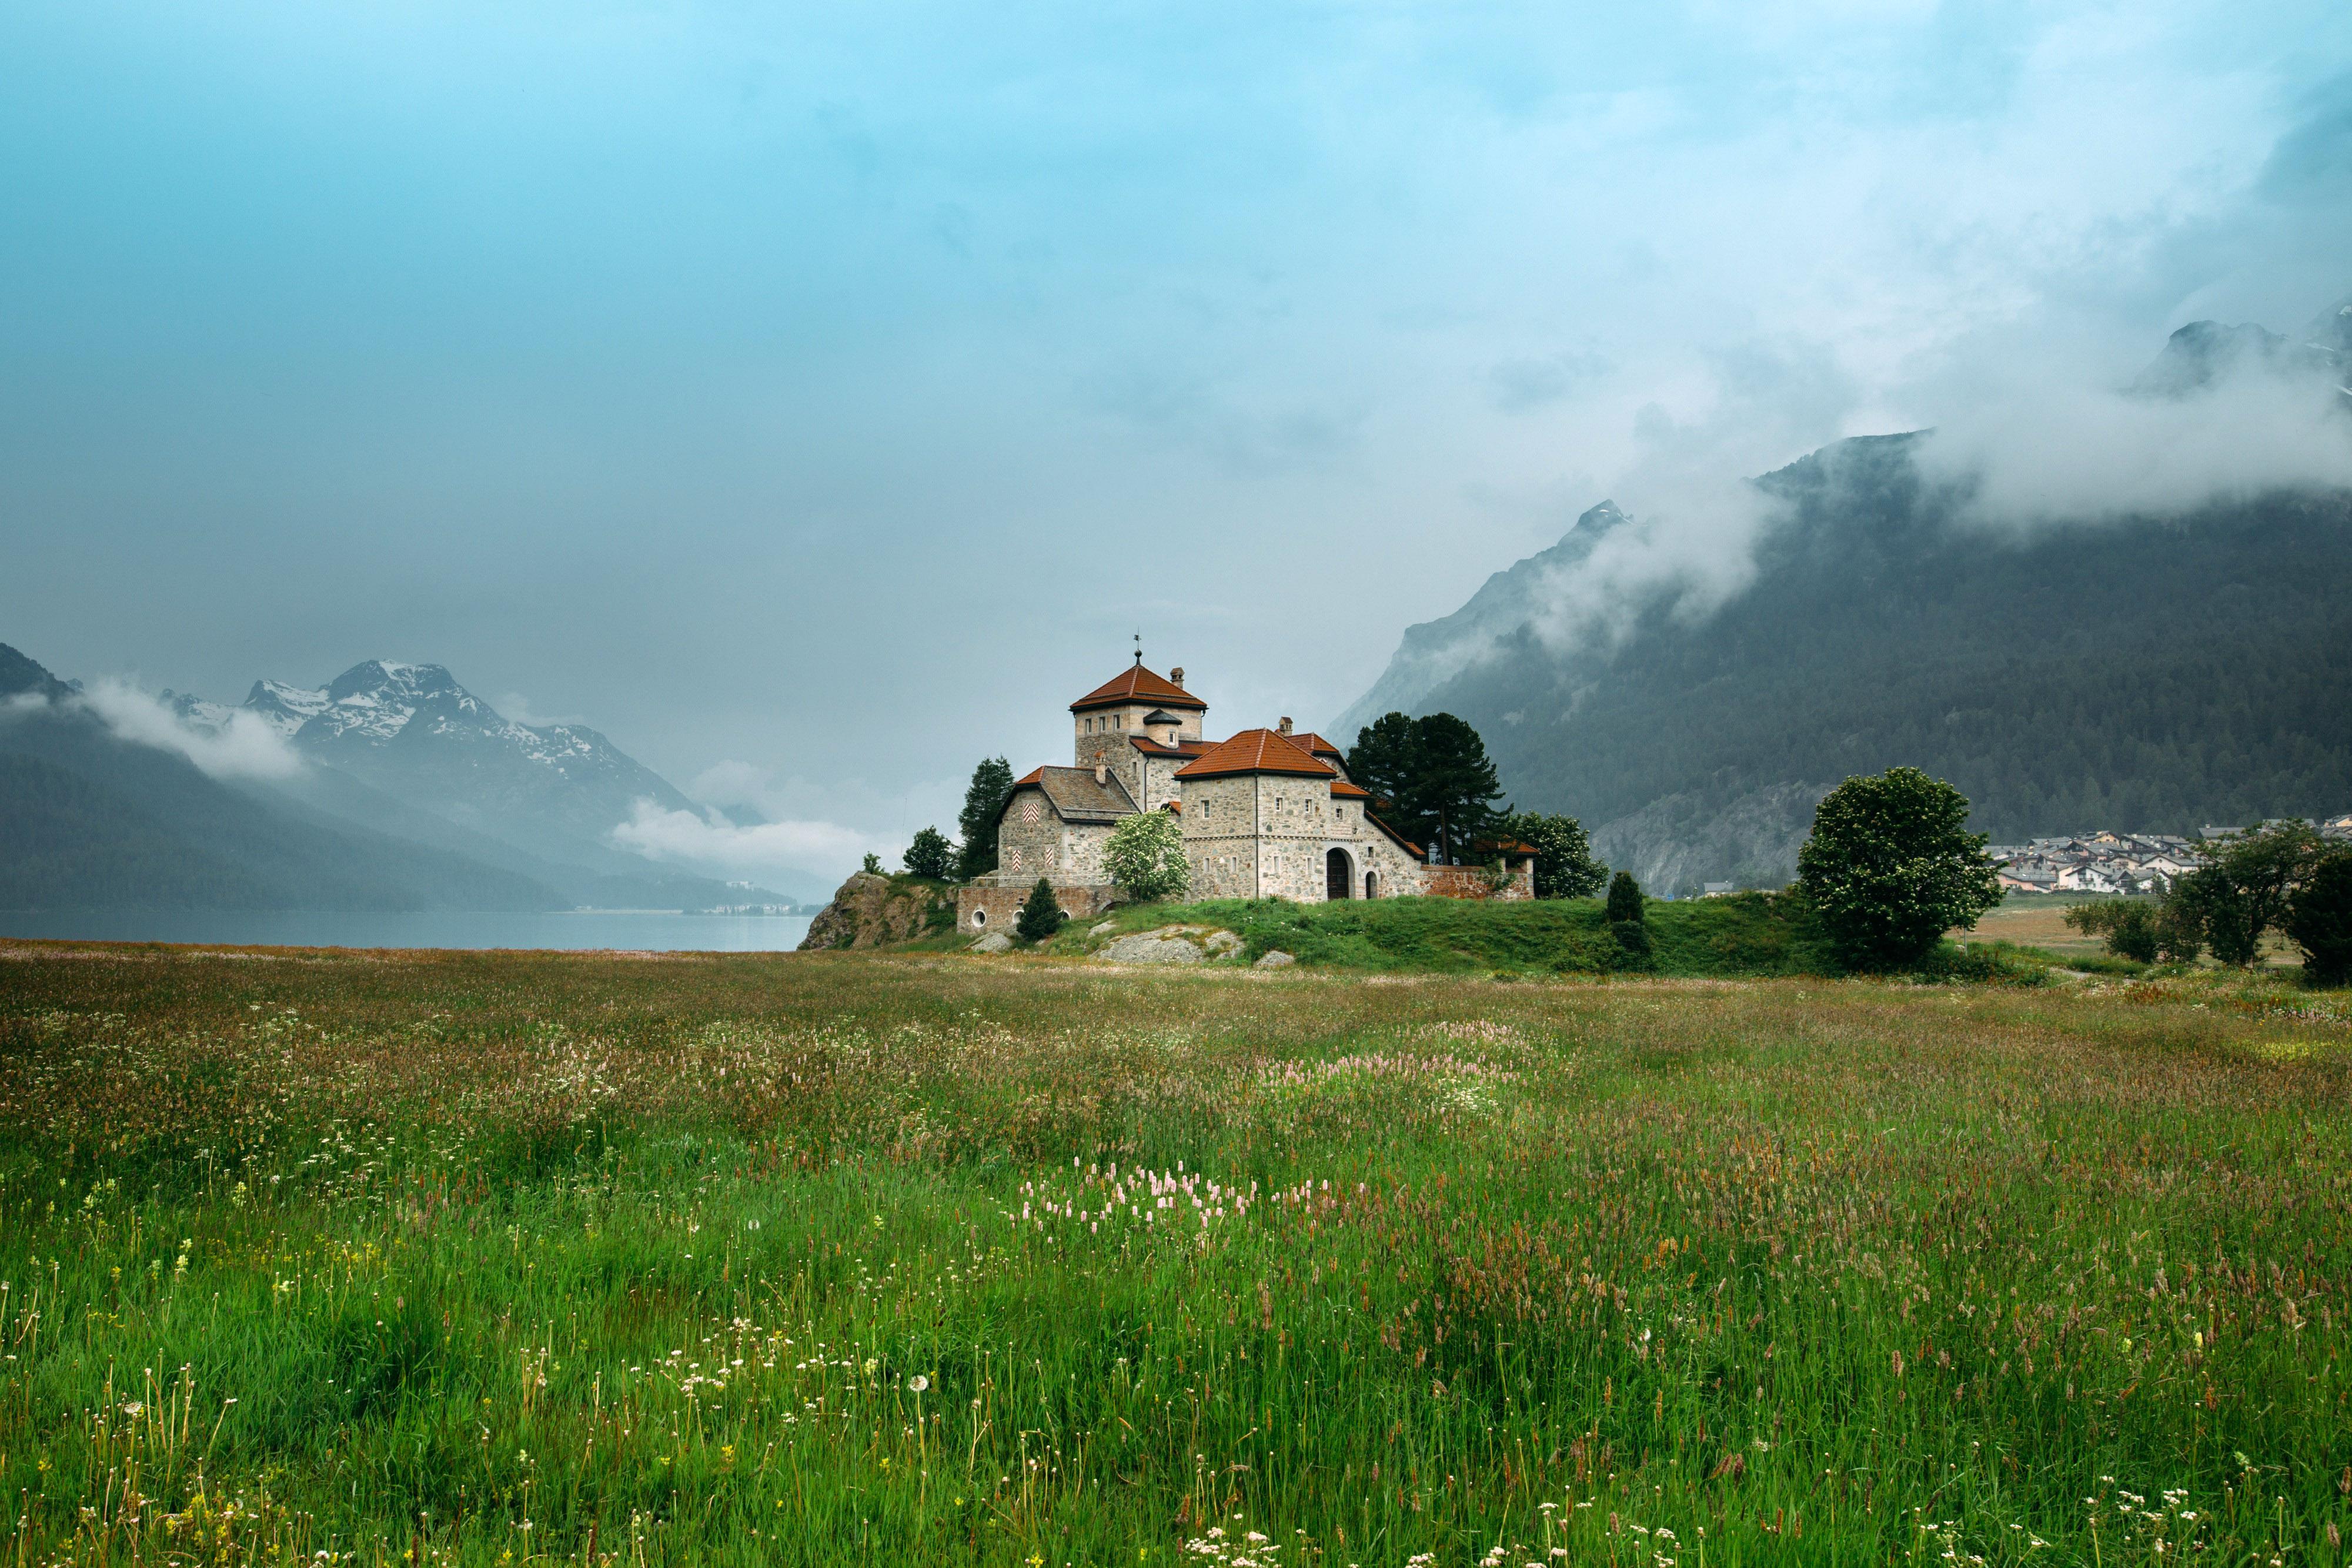 Castle on the end of a grassy field in Saint Moritz, Switzerland.